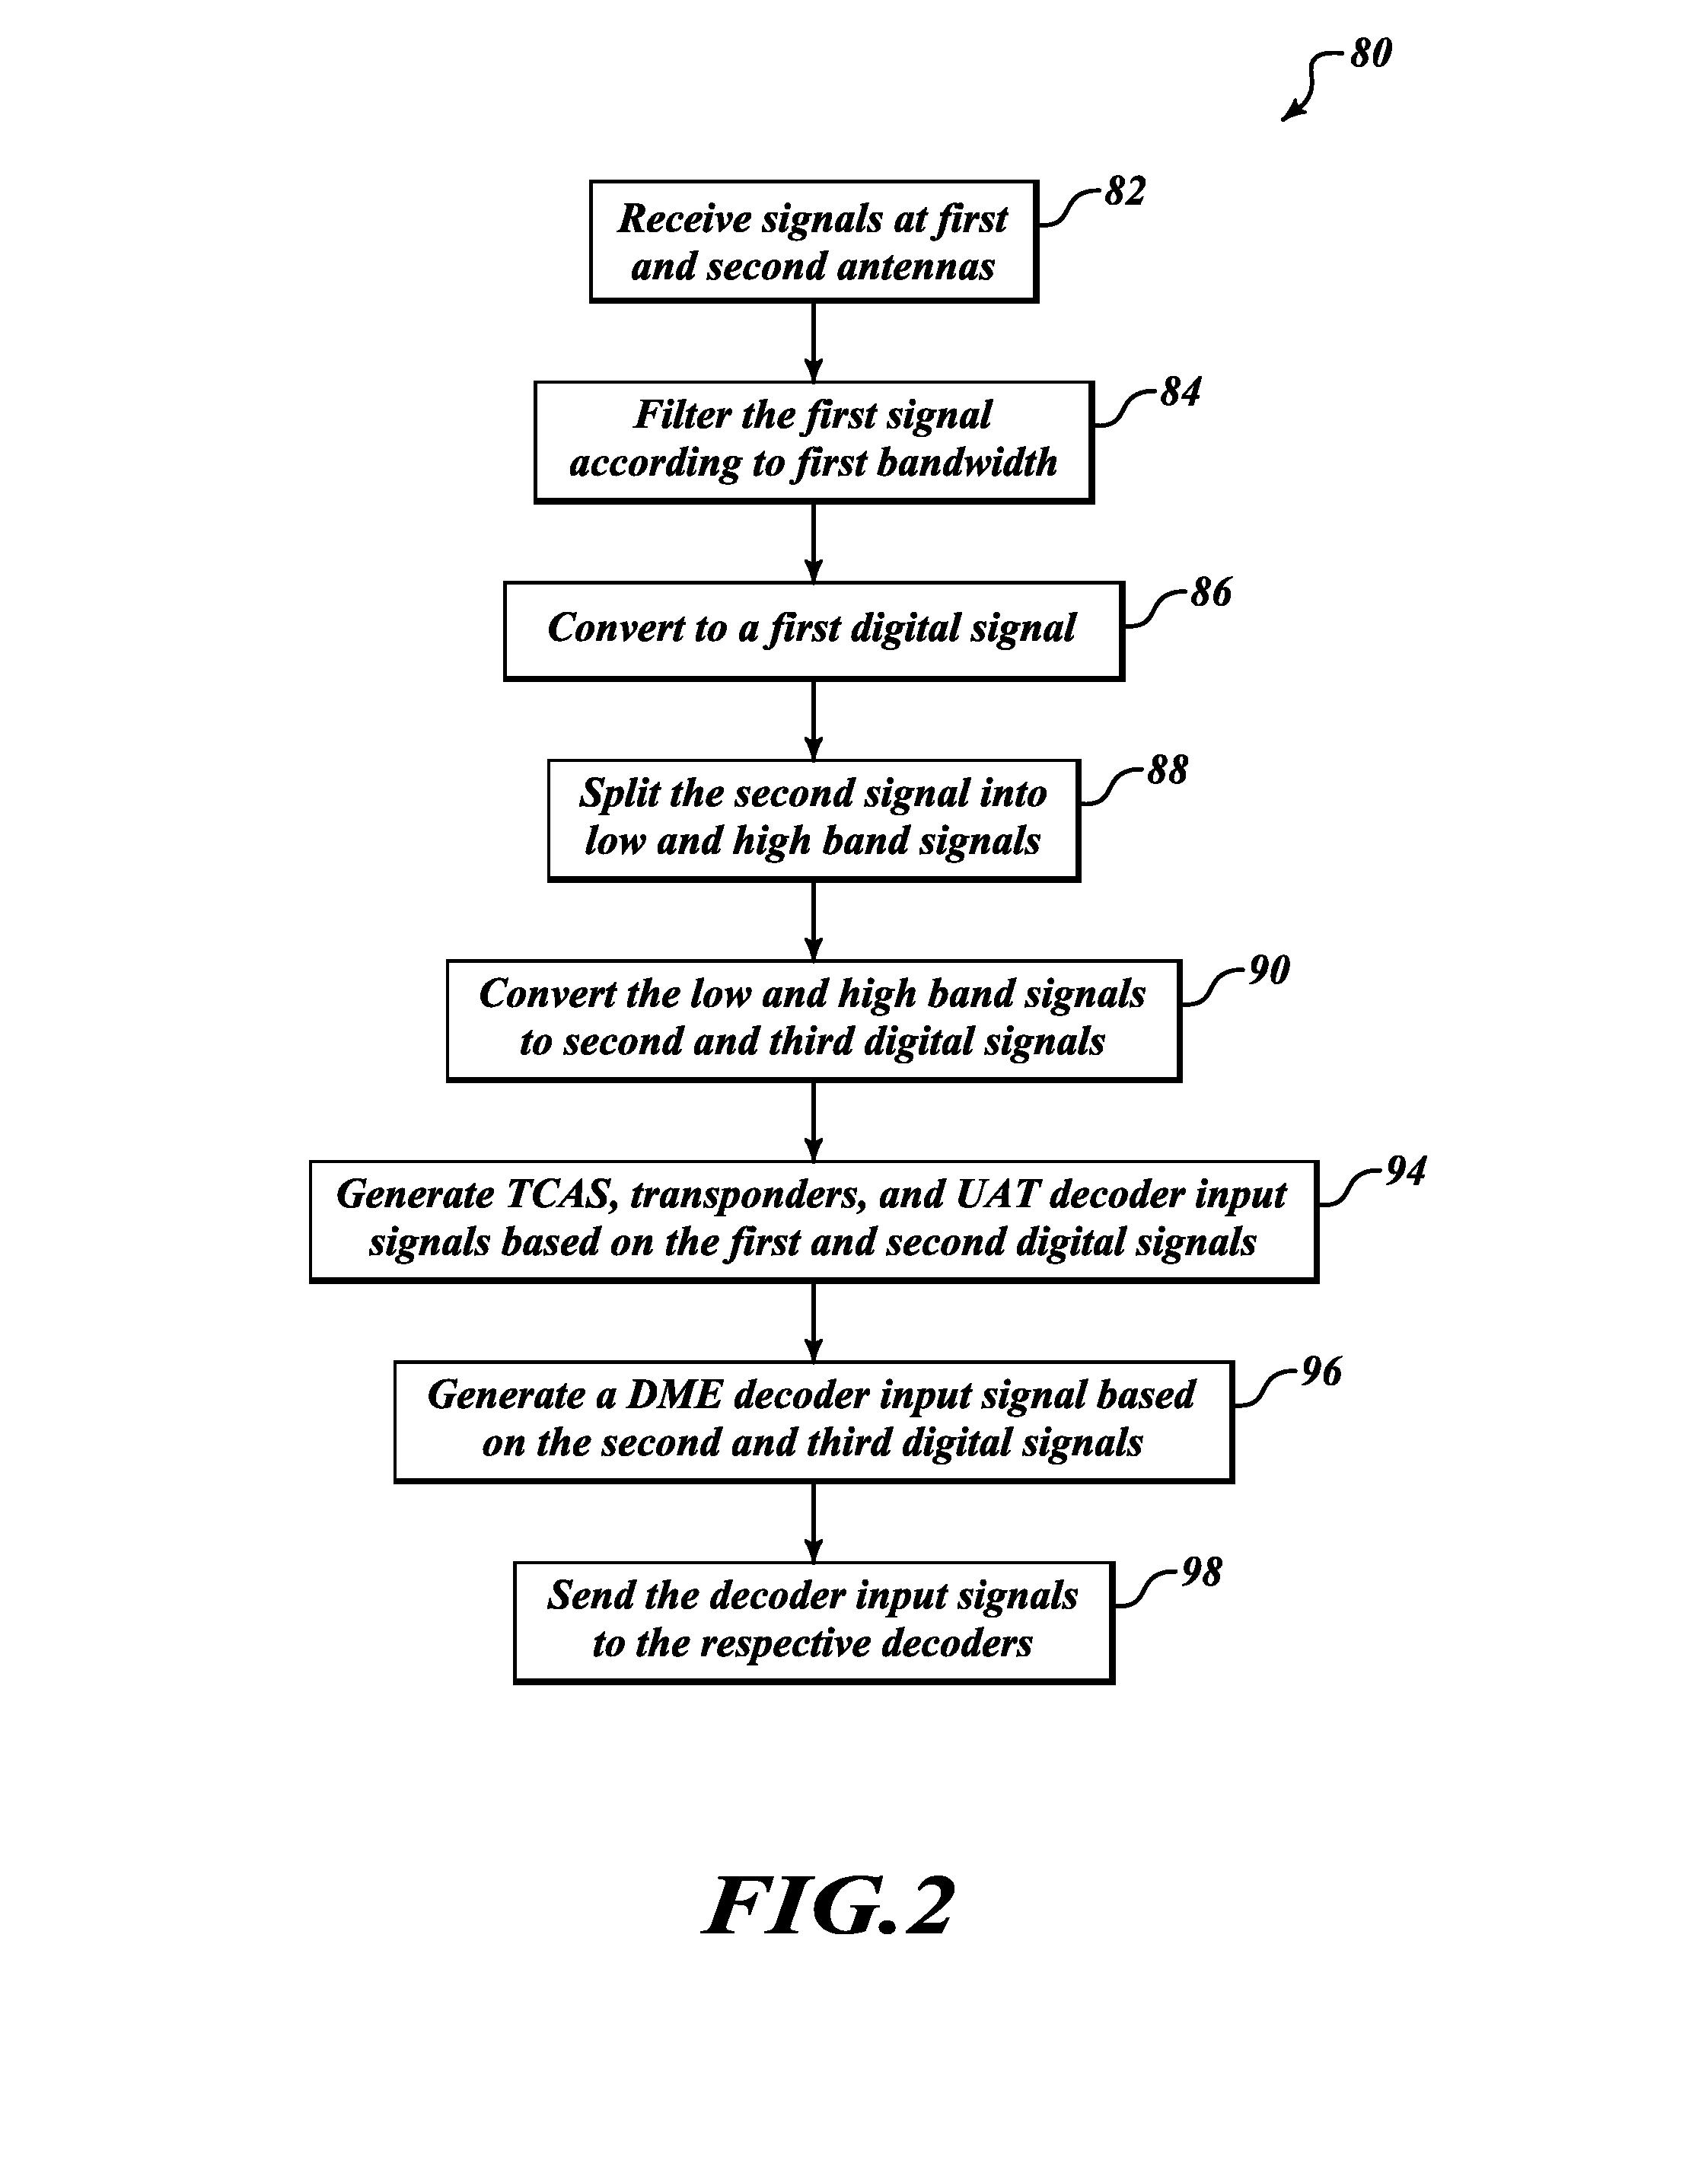 Patent US 8,593,330 B2